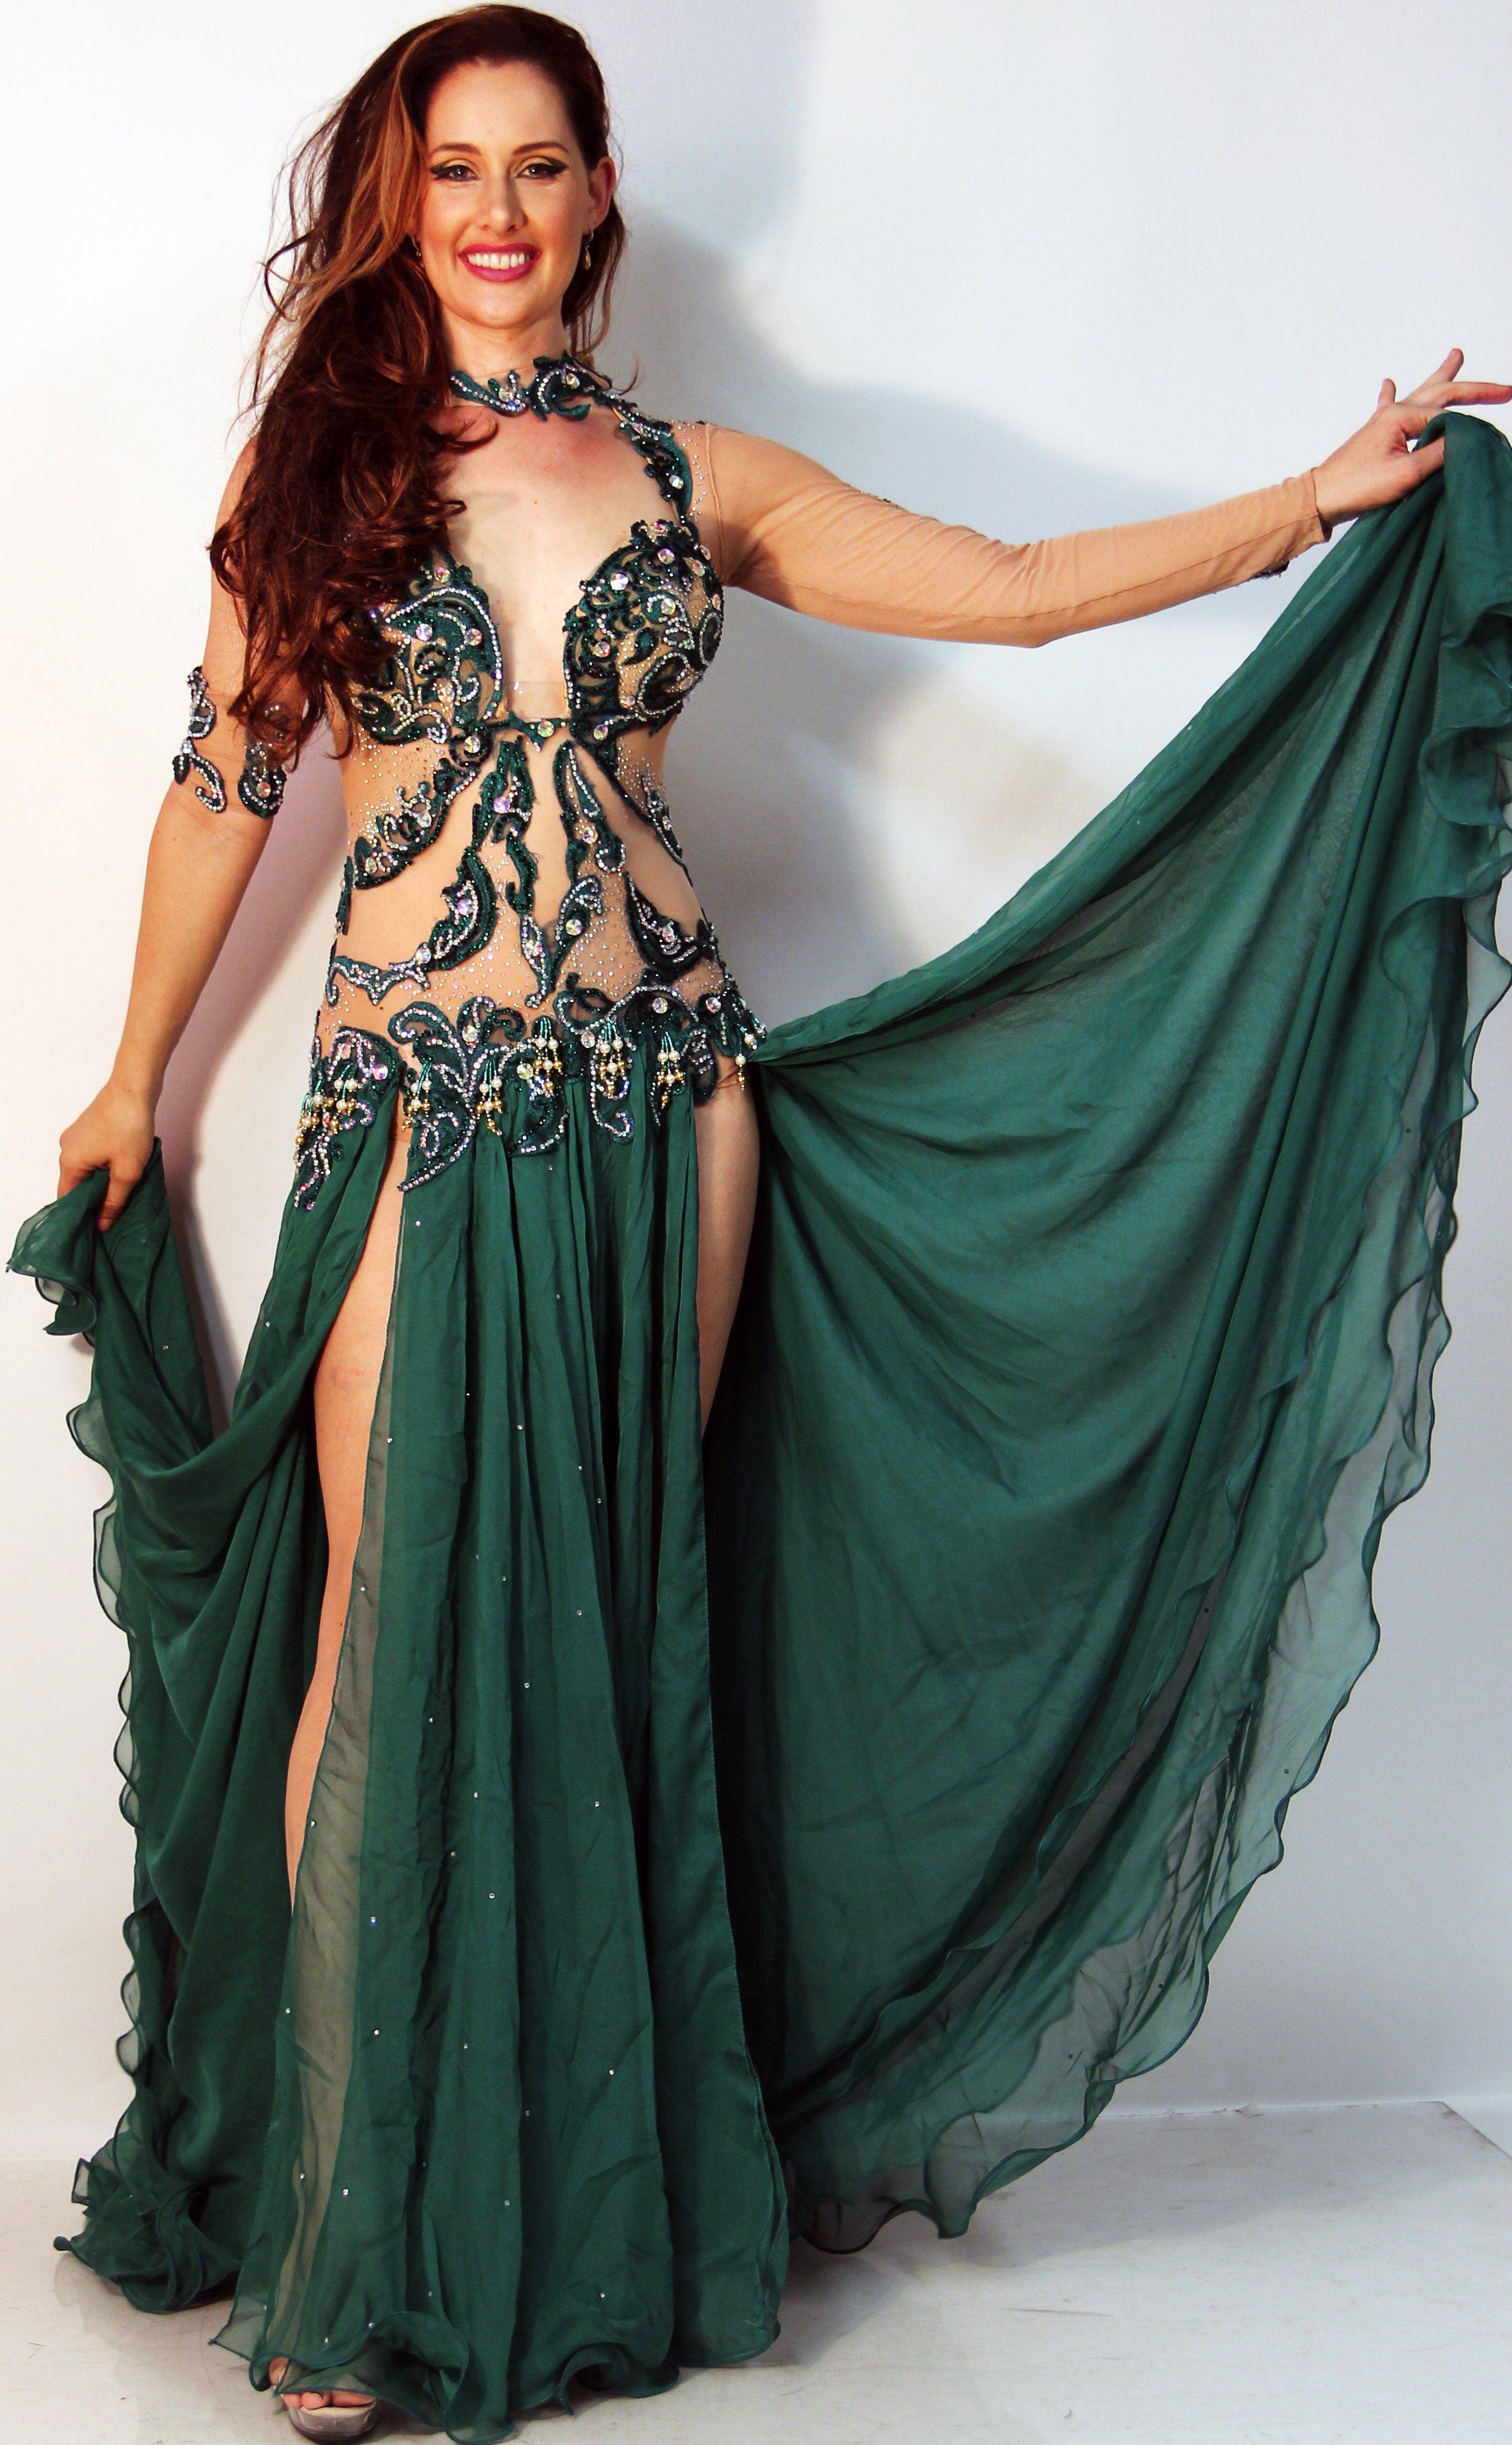 80ea020cee892 Eman Zaki One-Piece Costume 23756 | Cab/Egyptian Bellydance | Belly ...